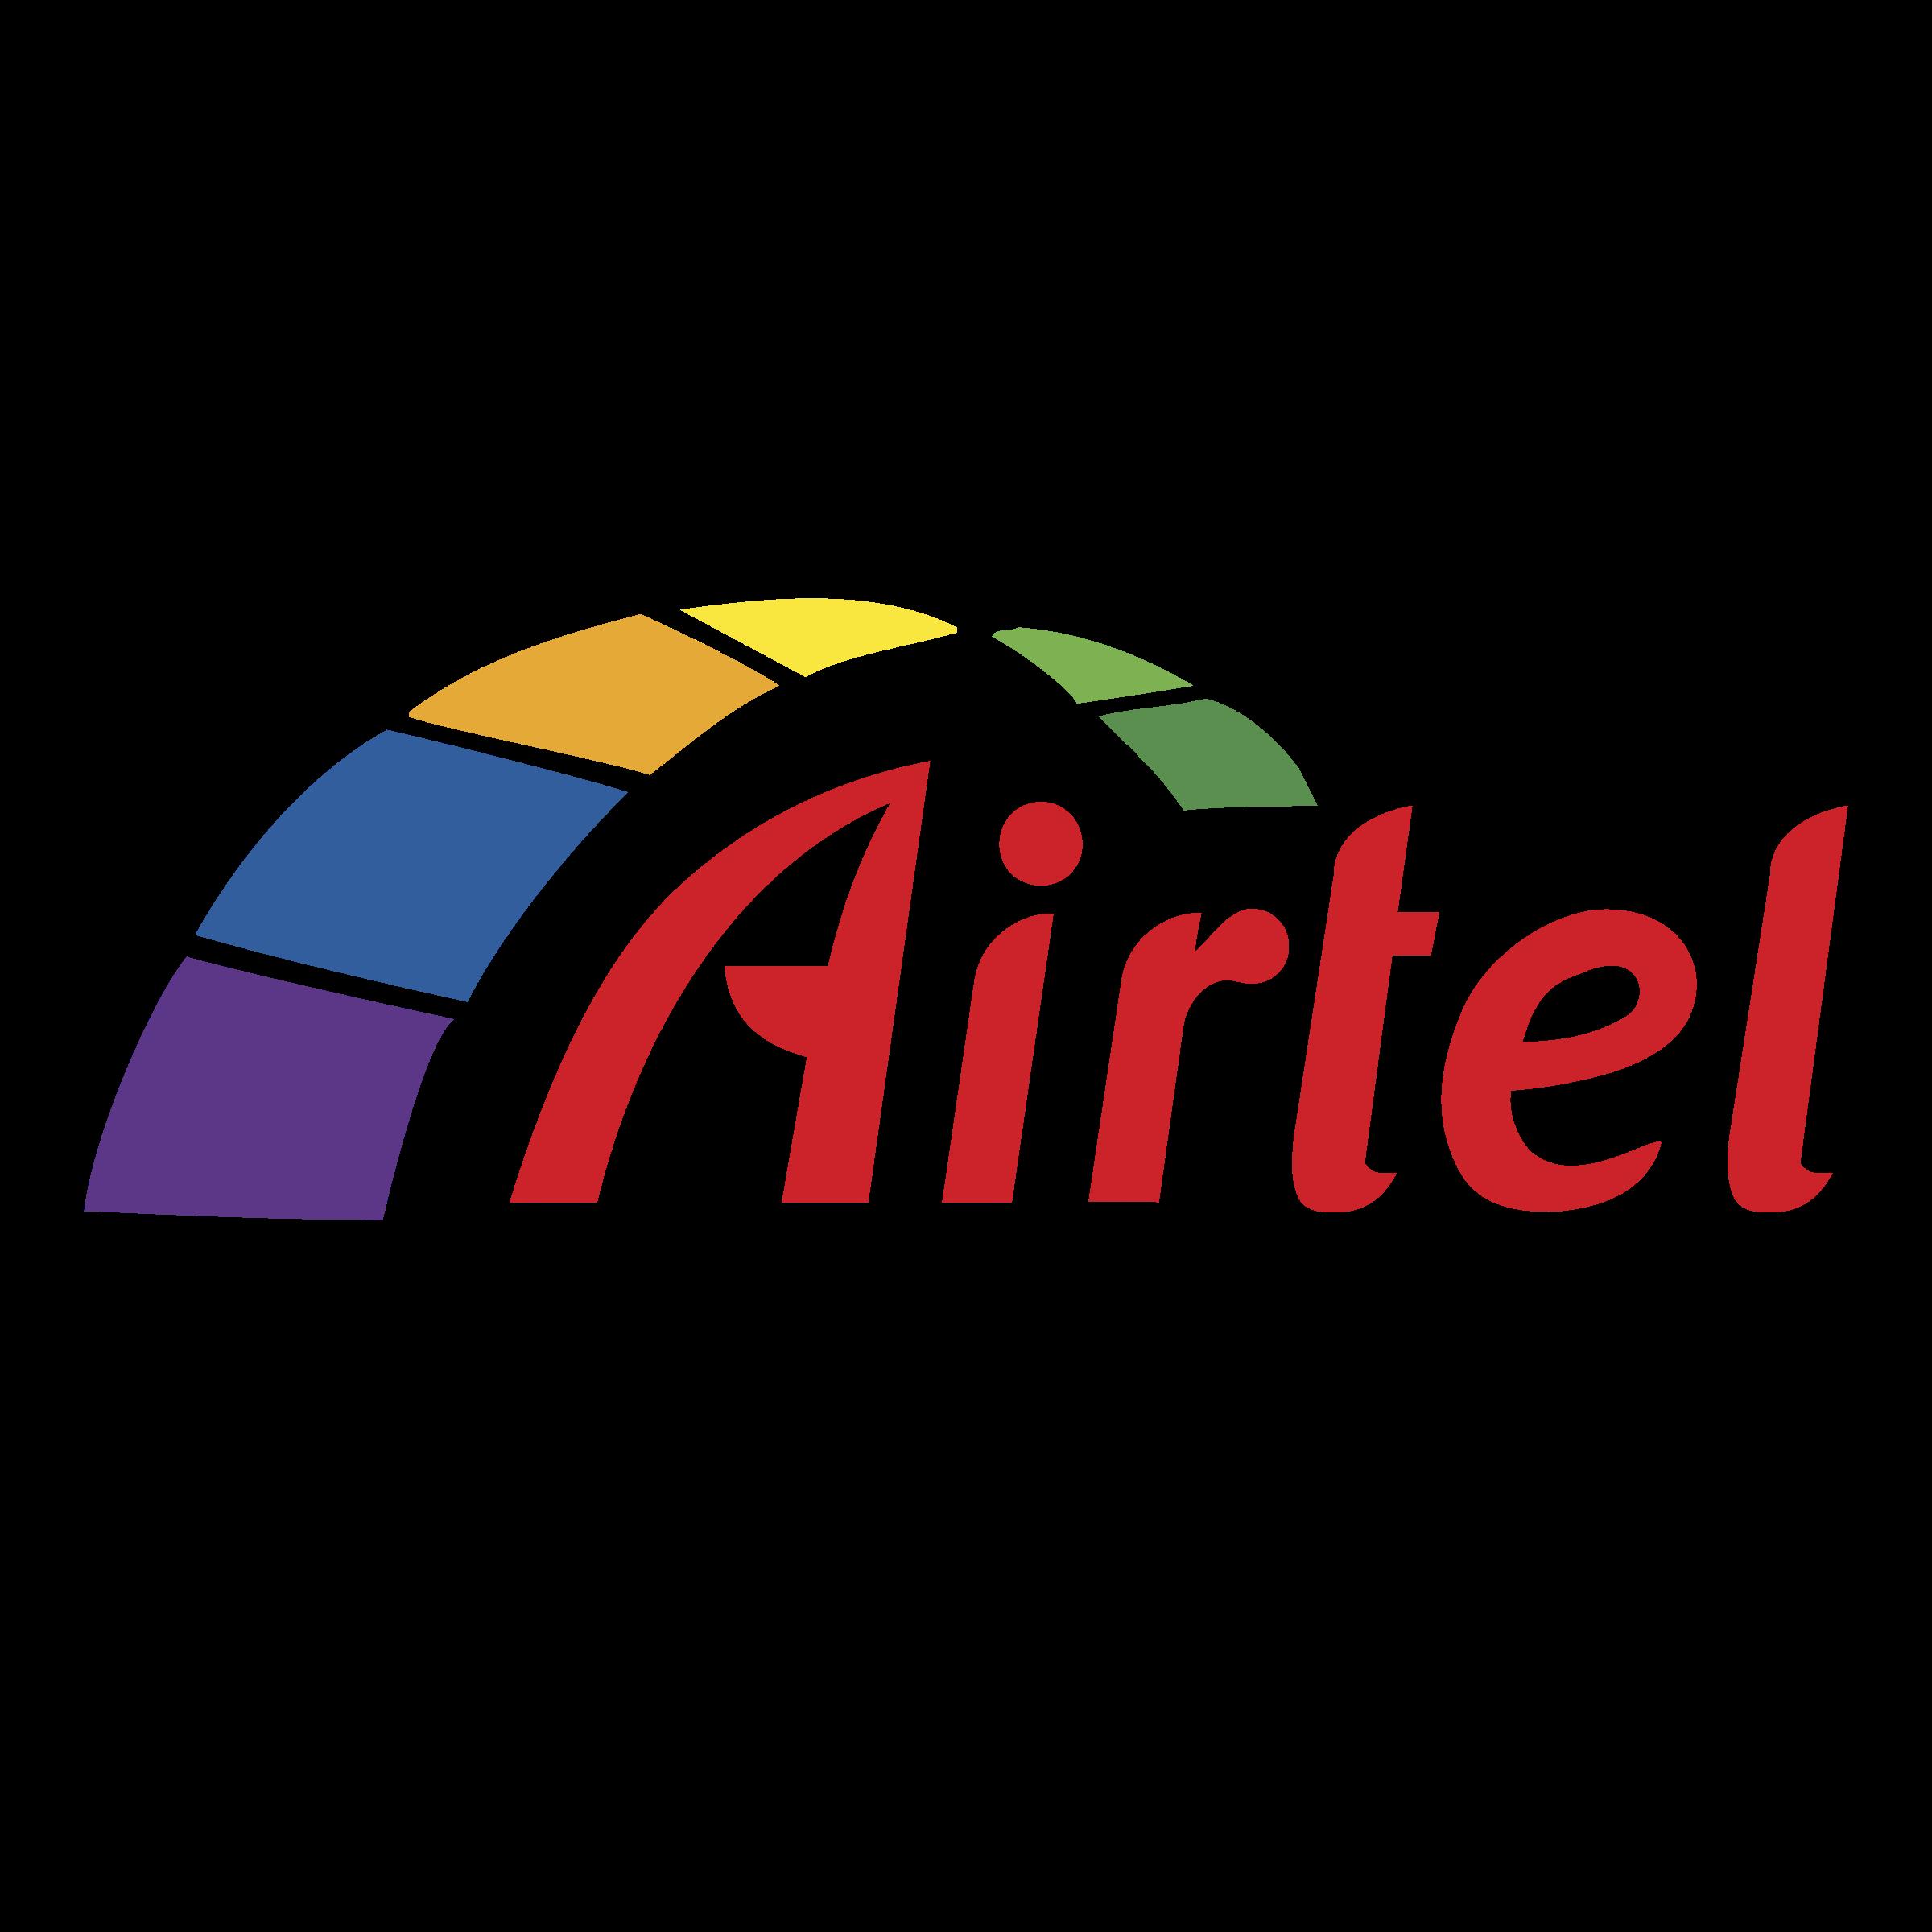 Airtel 01 Logo PNG Transparent & SVG Vector.